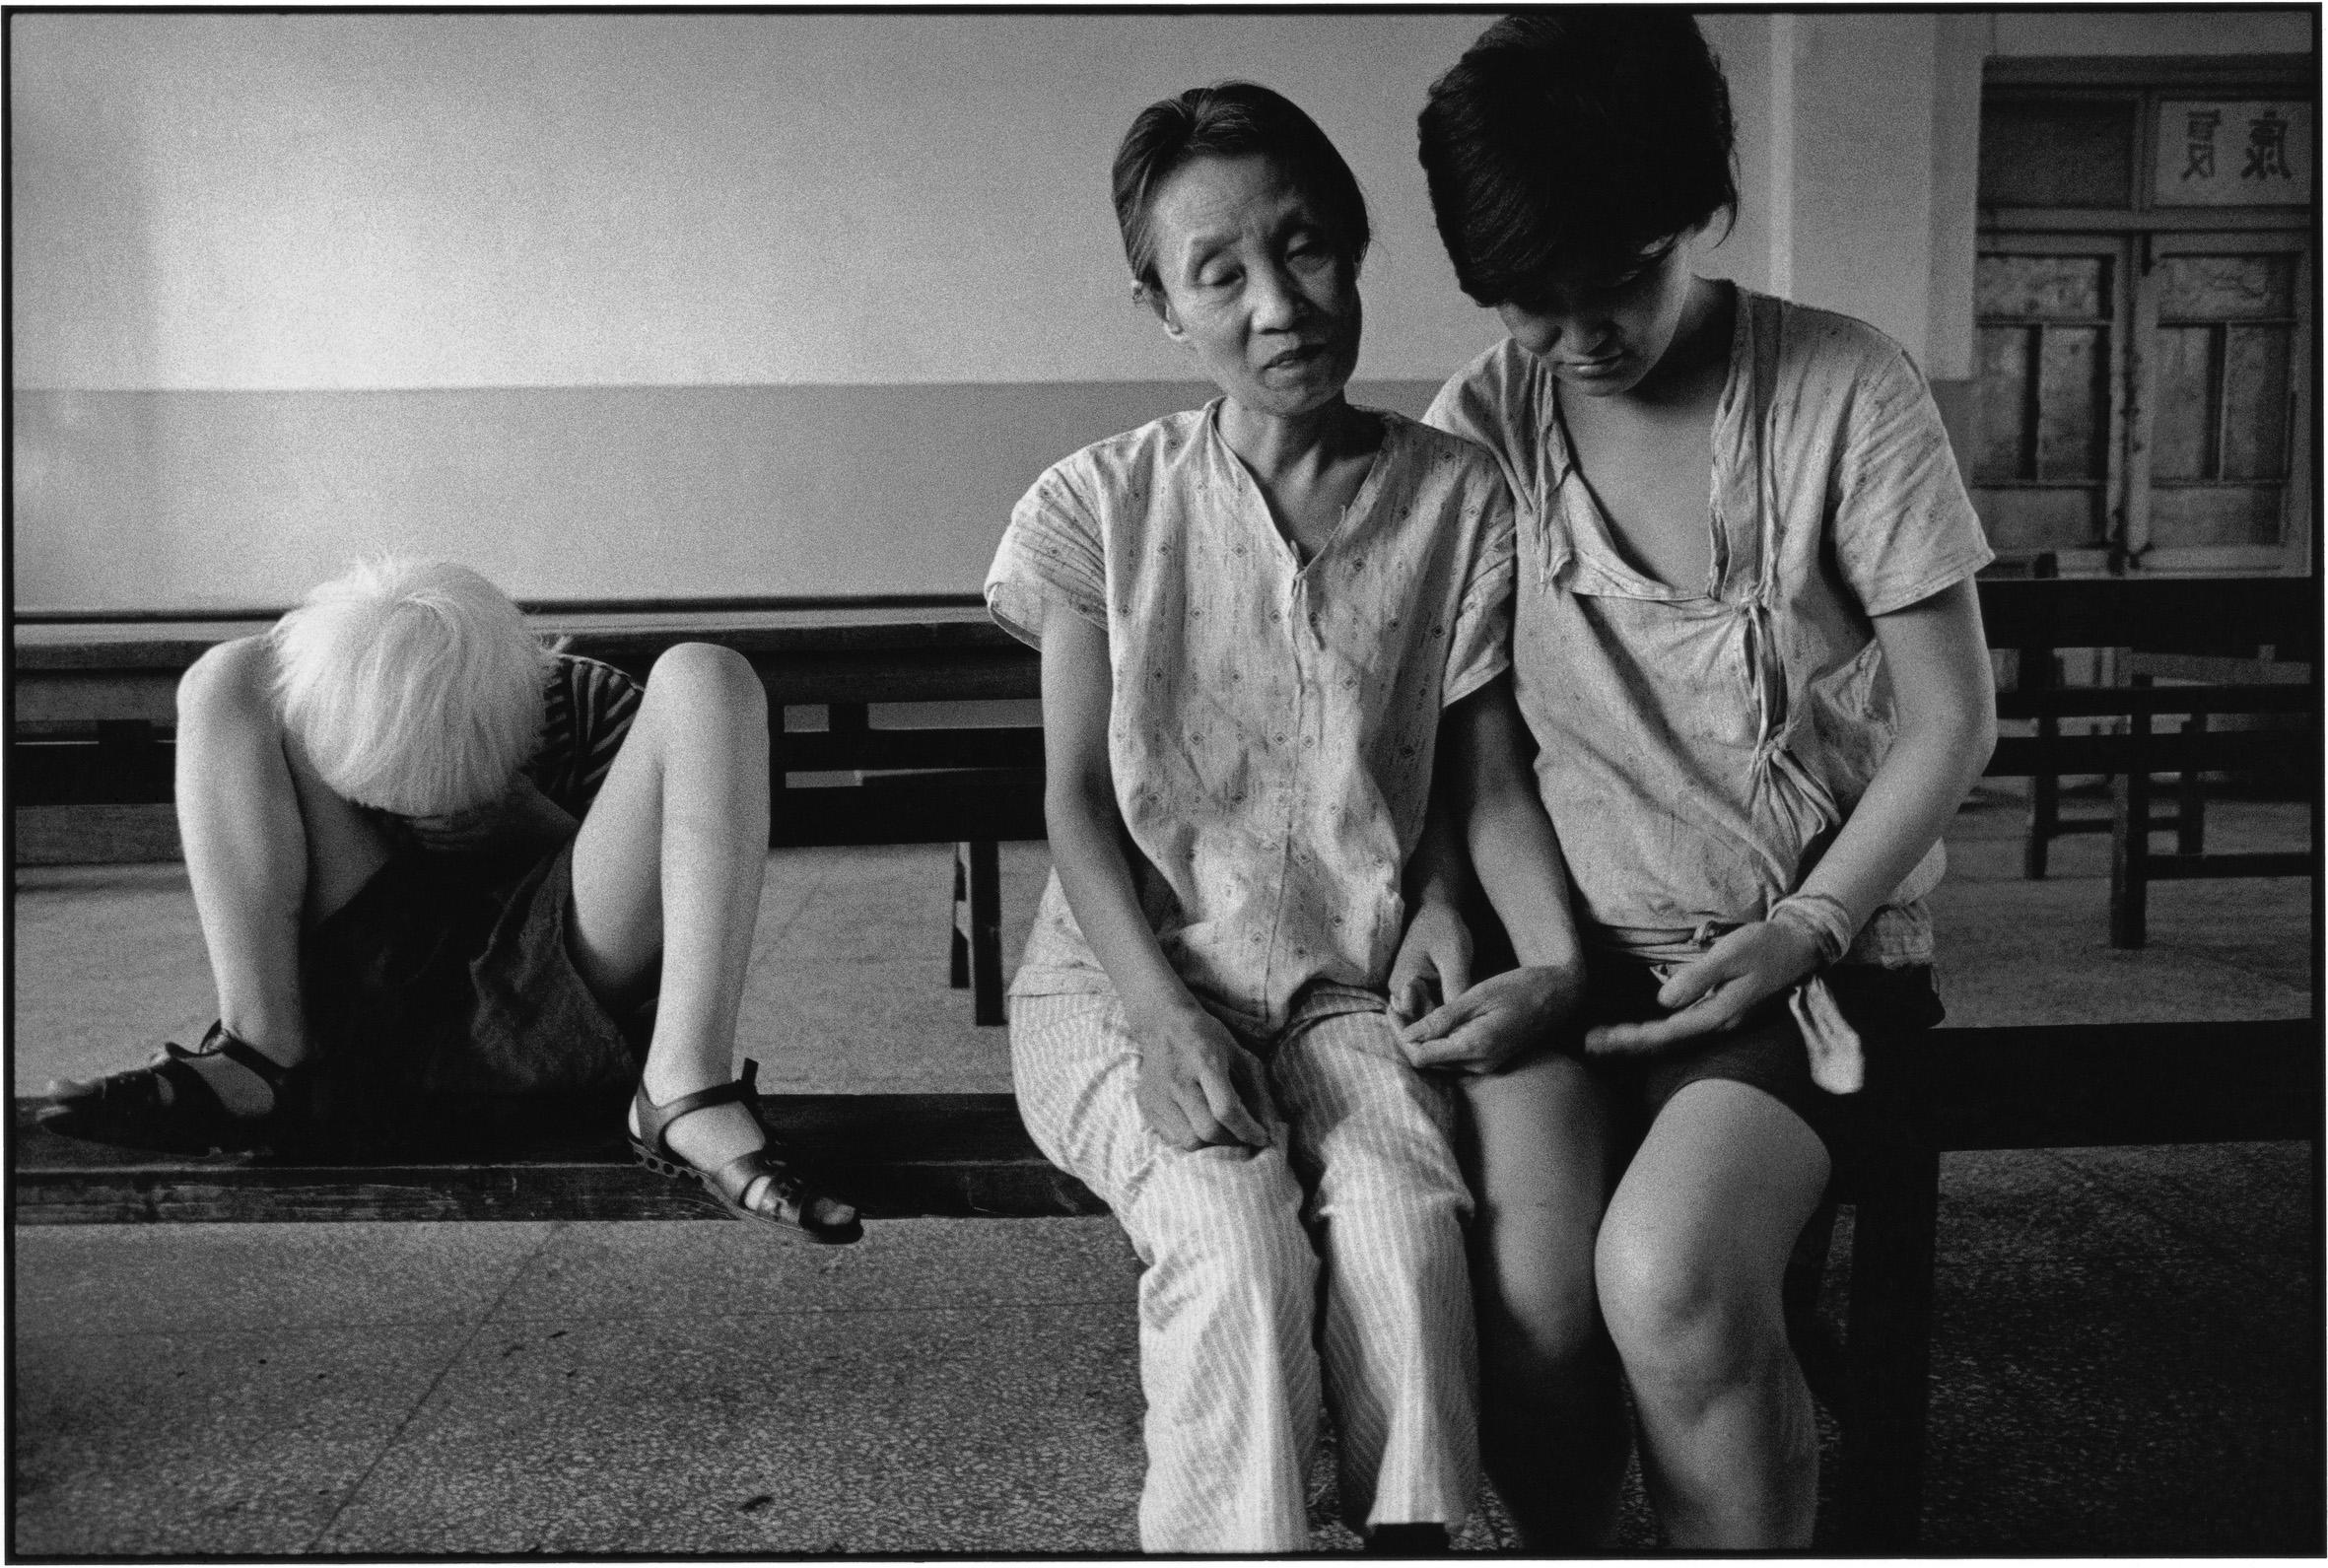 Mental Hospital, Tianjin, China